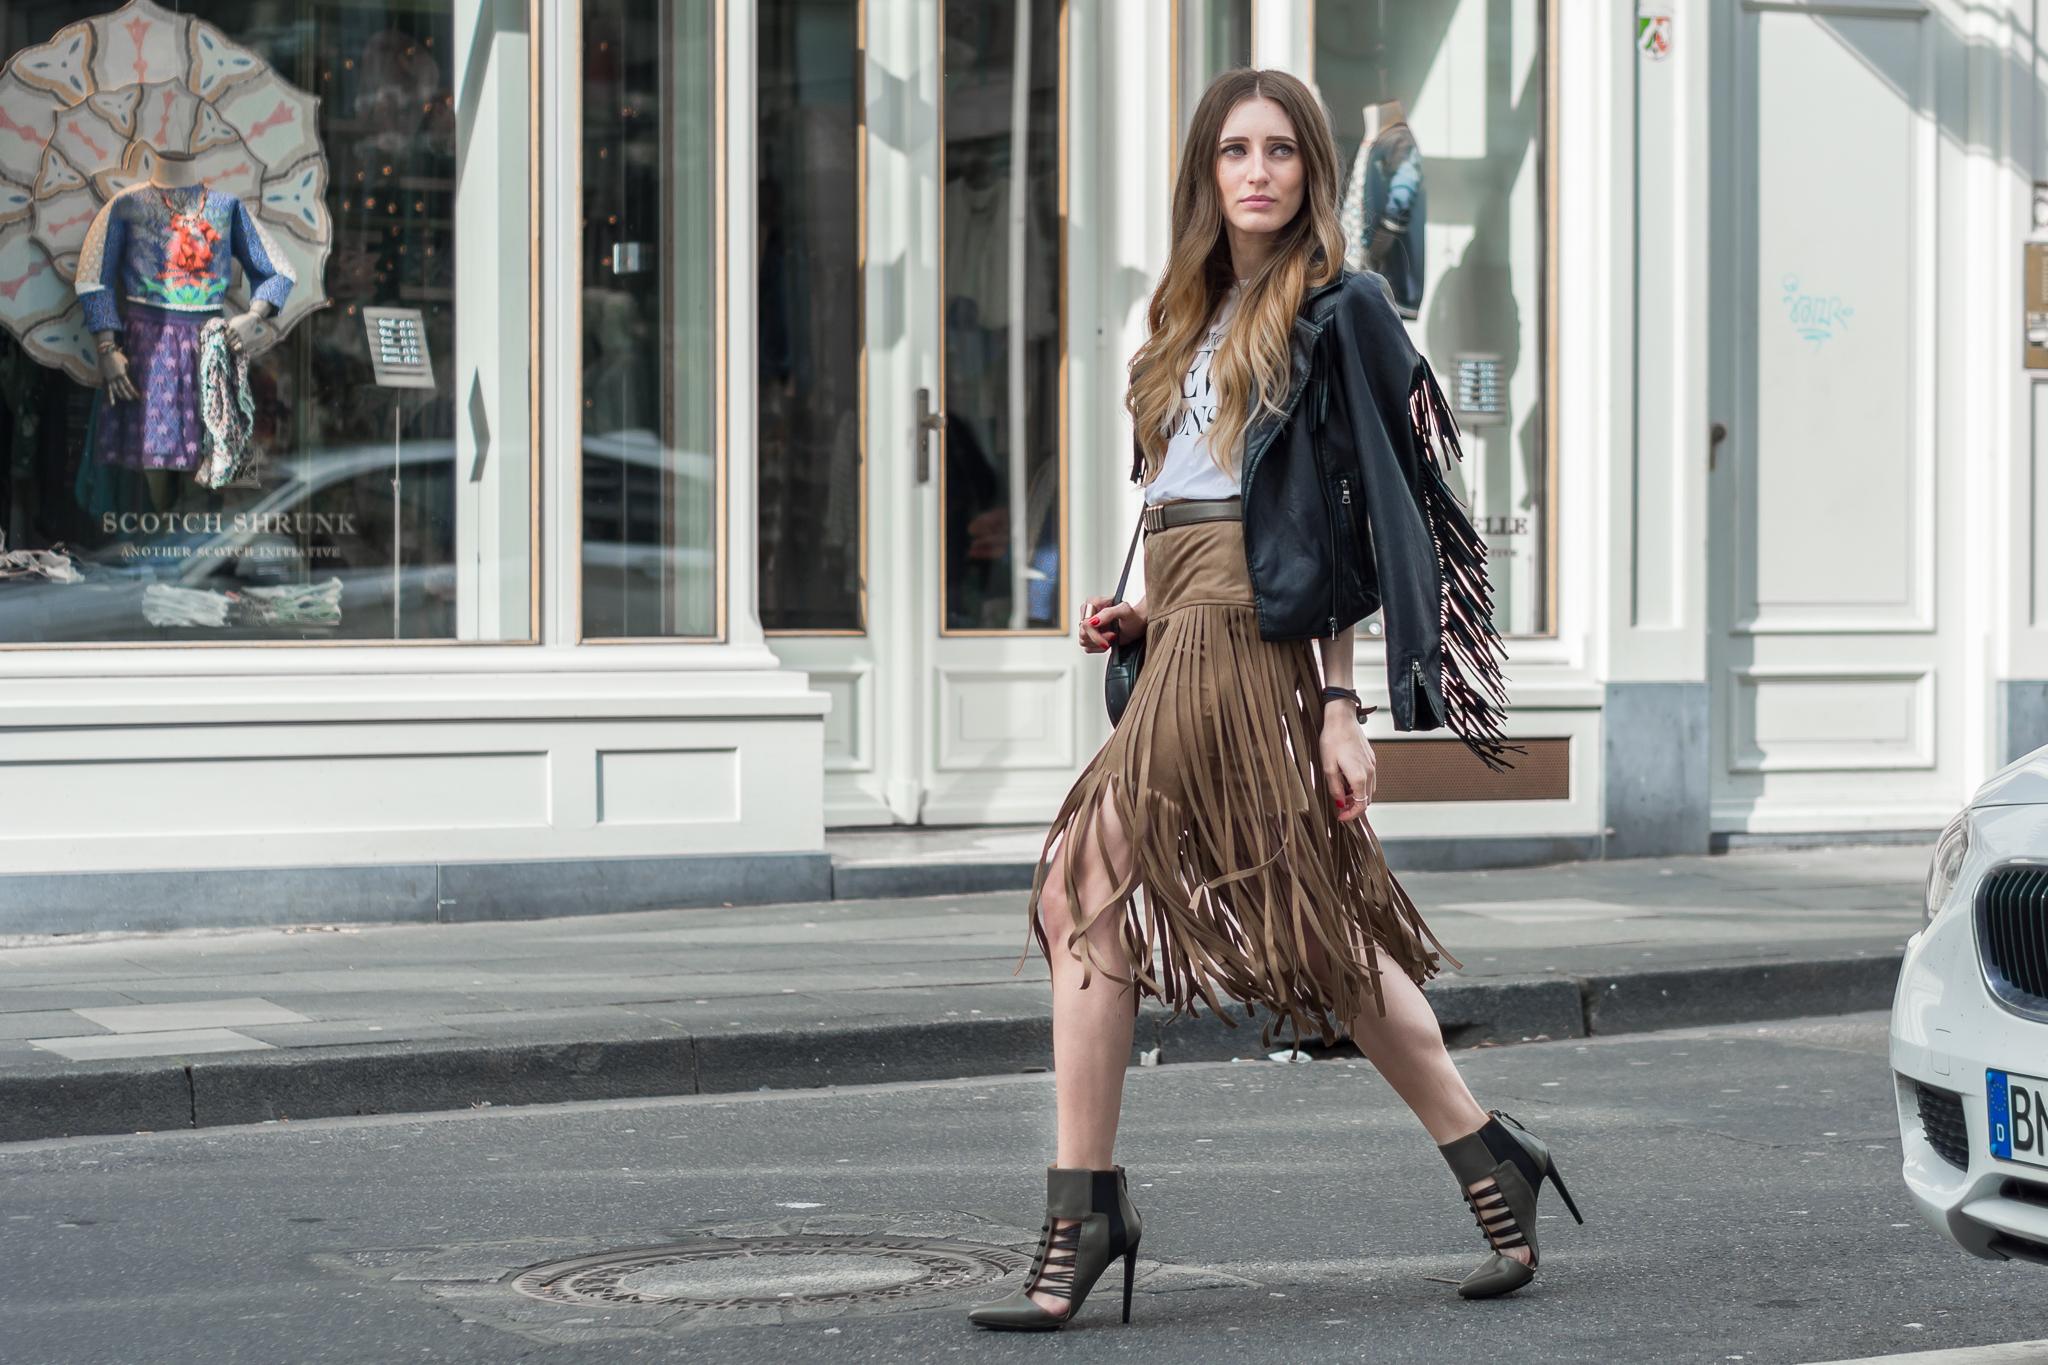 The perfect Fringe Skirt & Gwen Stefani x JustFab | Lisa Fiege